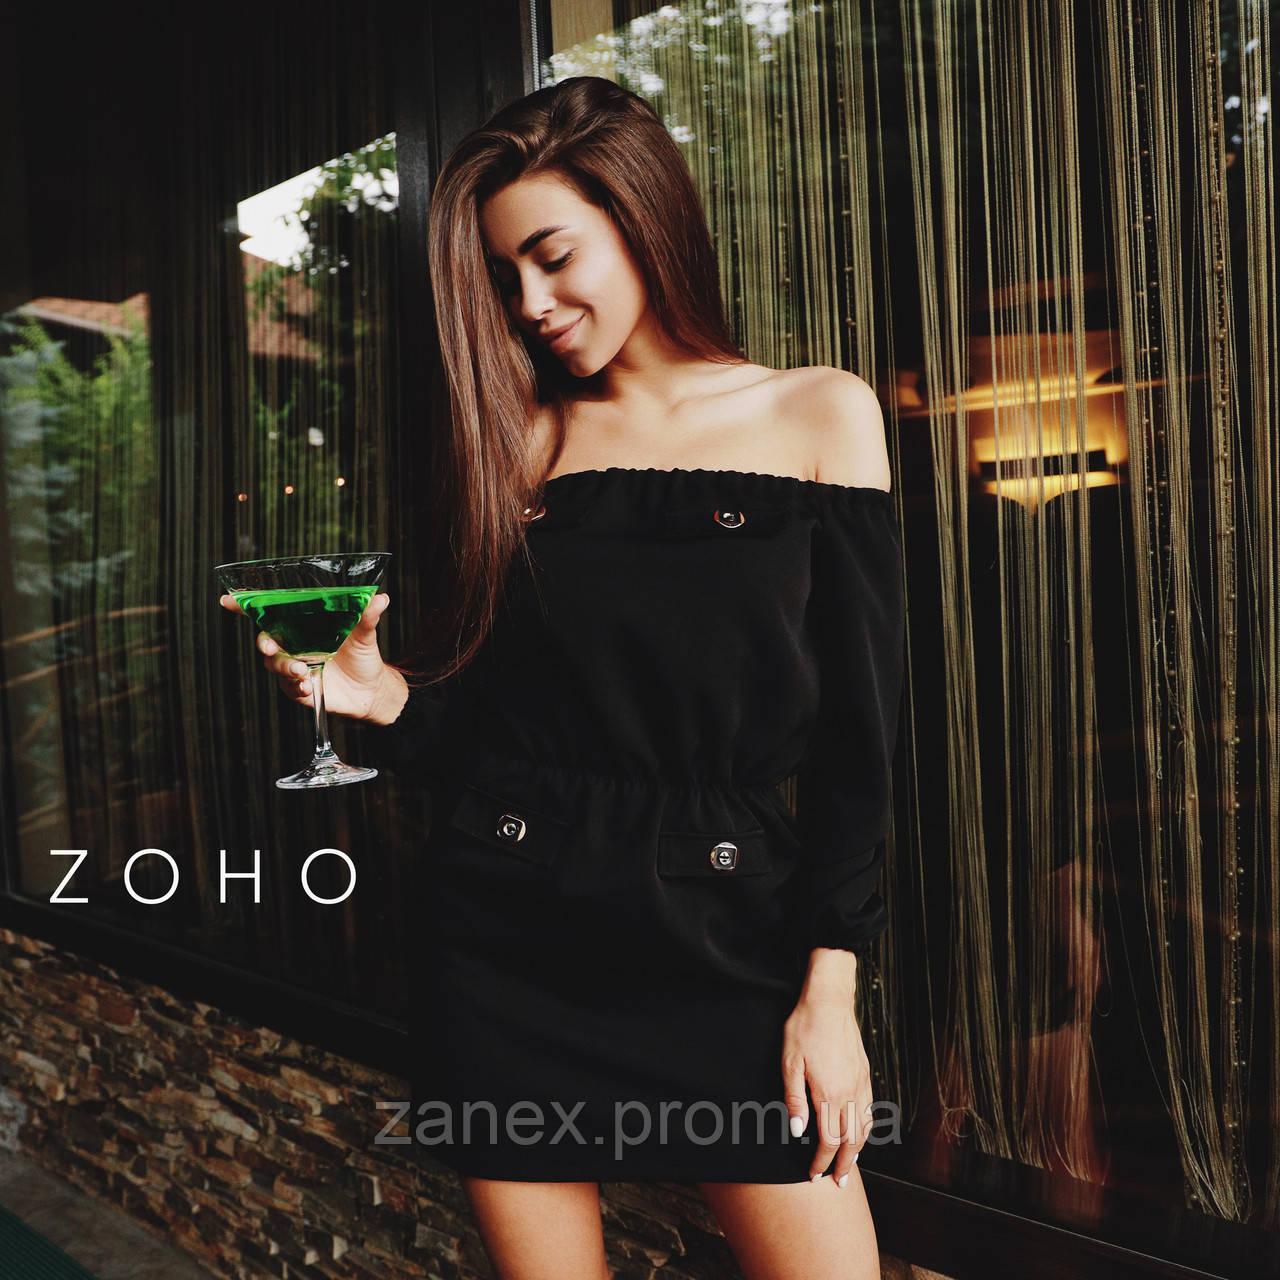 Платье Zanex «Прао», черное